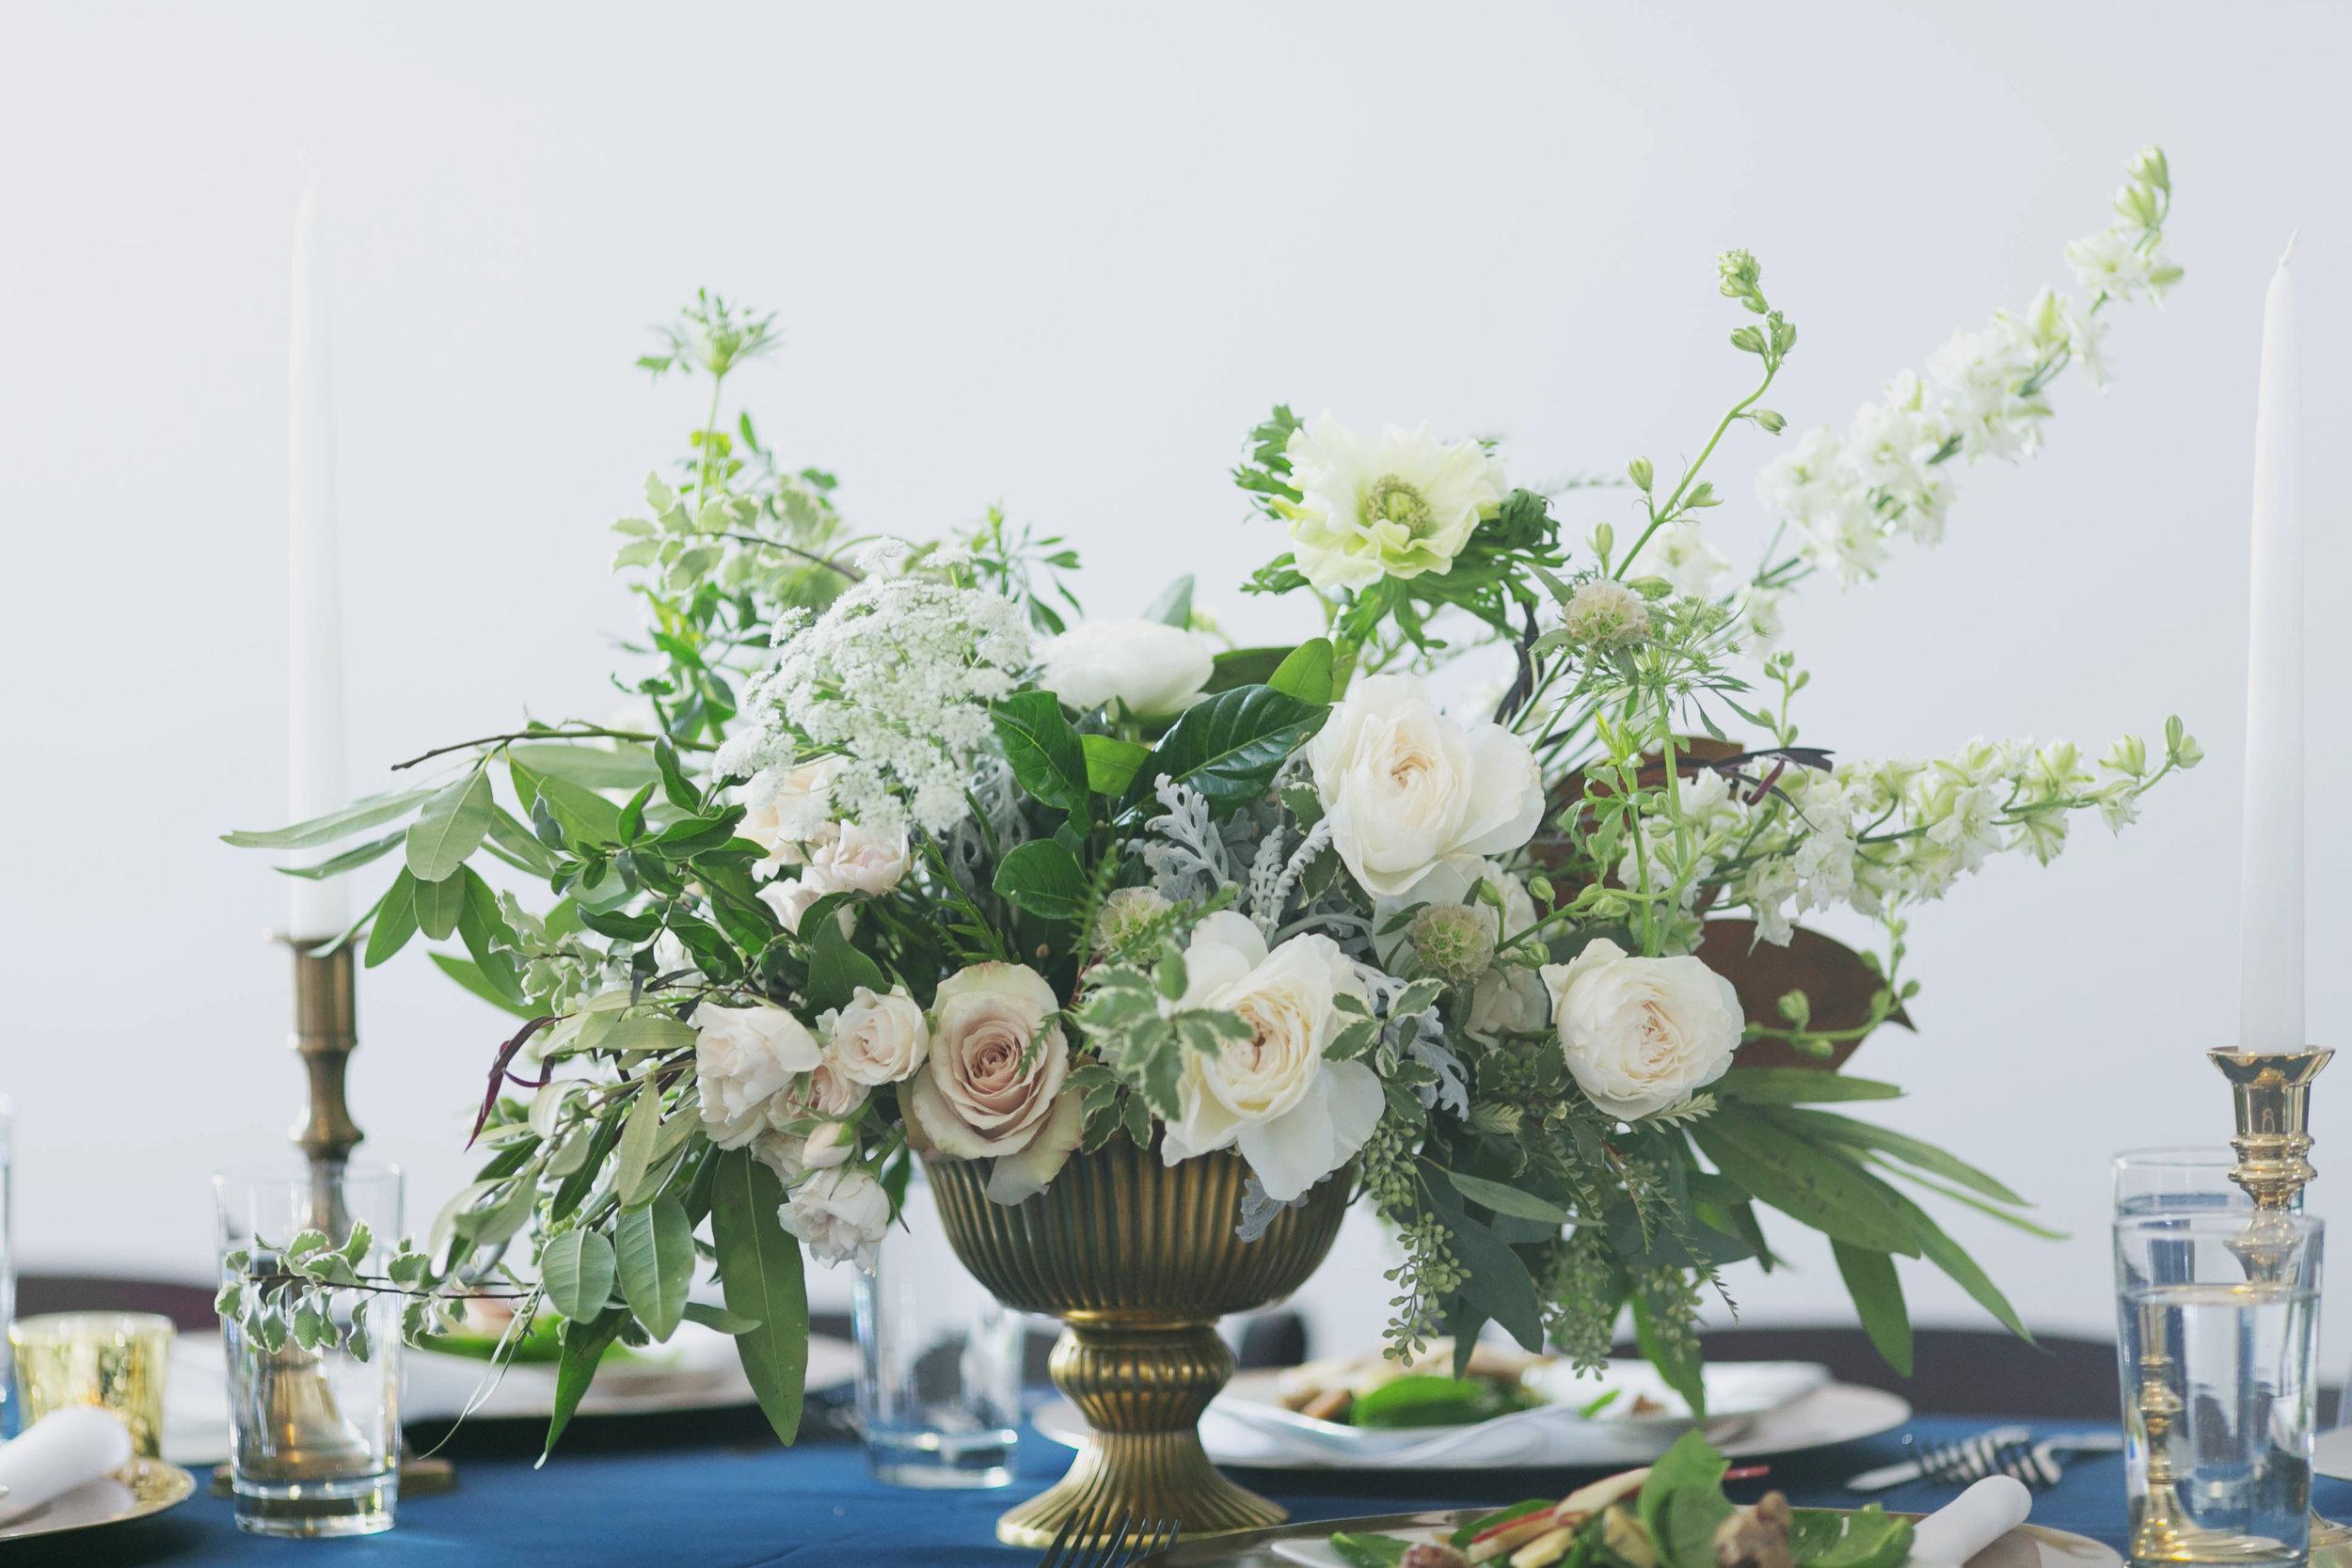 Simply-Charming-Socials_Atlanta-Wedding-Planner_Our-Labor-Of-Love_Emily-and-Jon_22.jpg